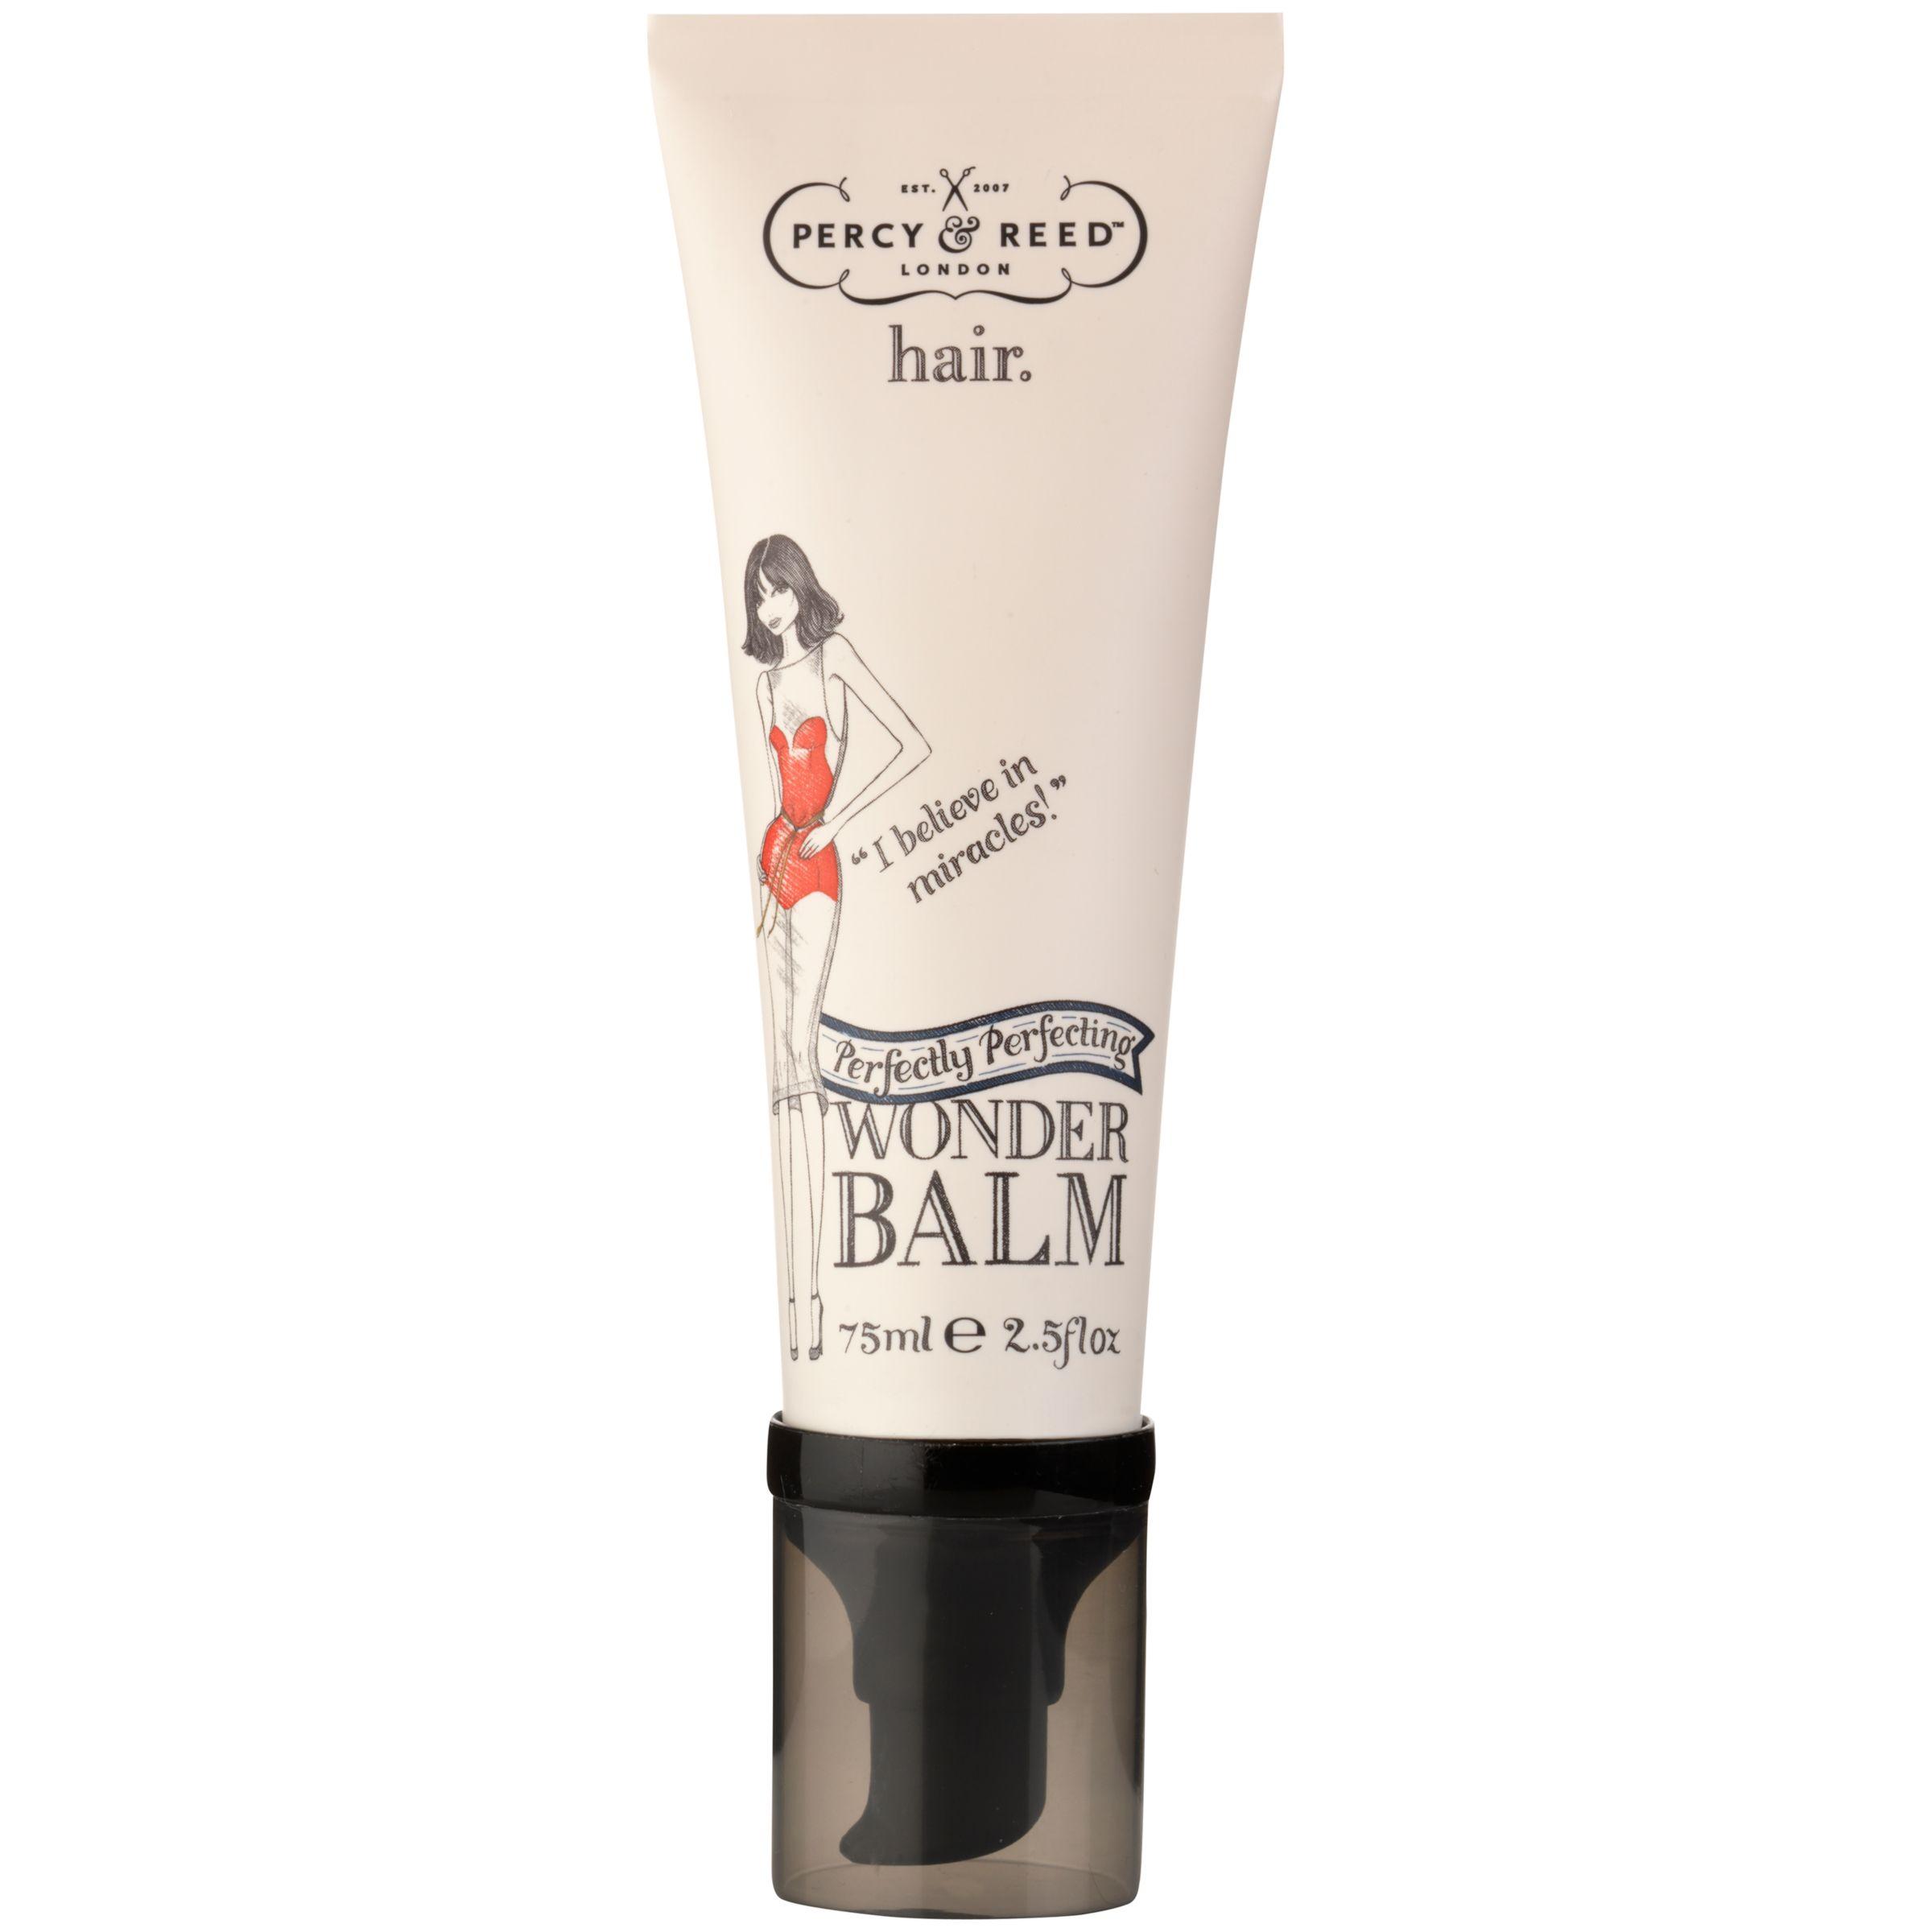 Percy & Reed Percy & Reed Wonder Balm Hair Treatment, 75ml